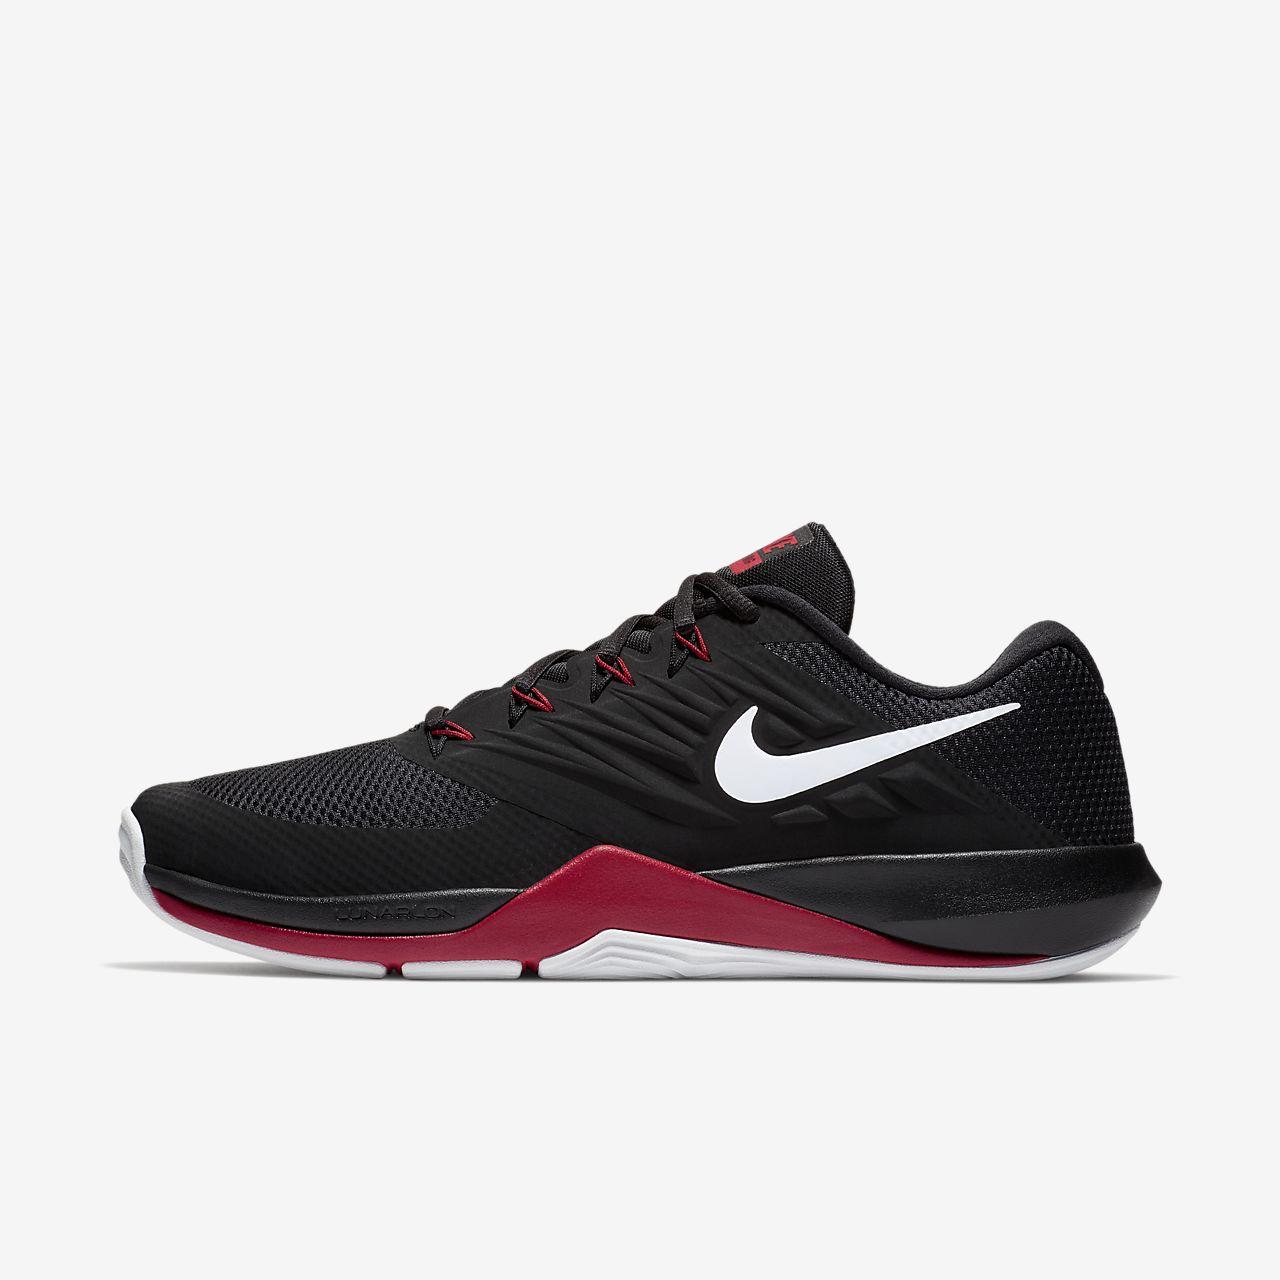 Men's Shoe Lunar Gymtrainingwalking Prime Iron Nike Ii aPf6OO